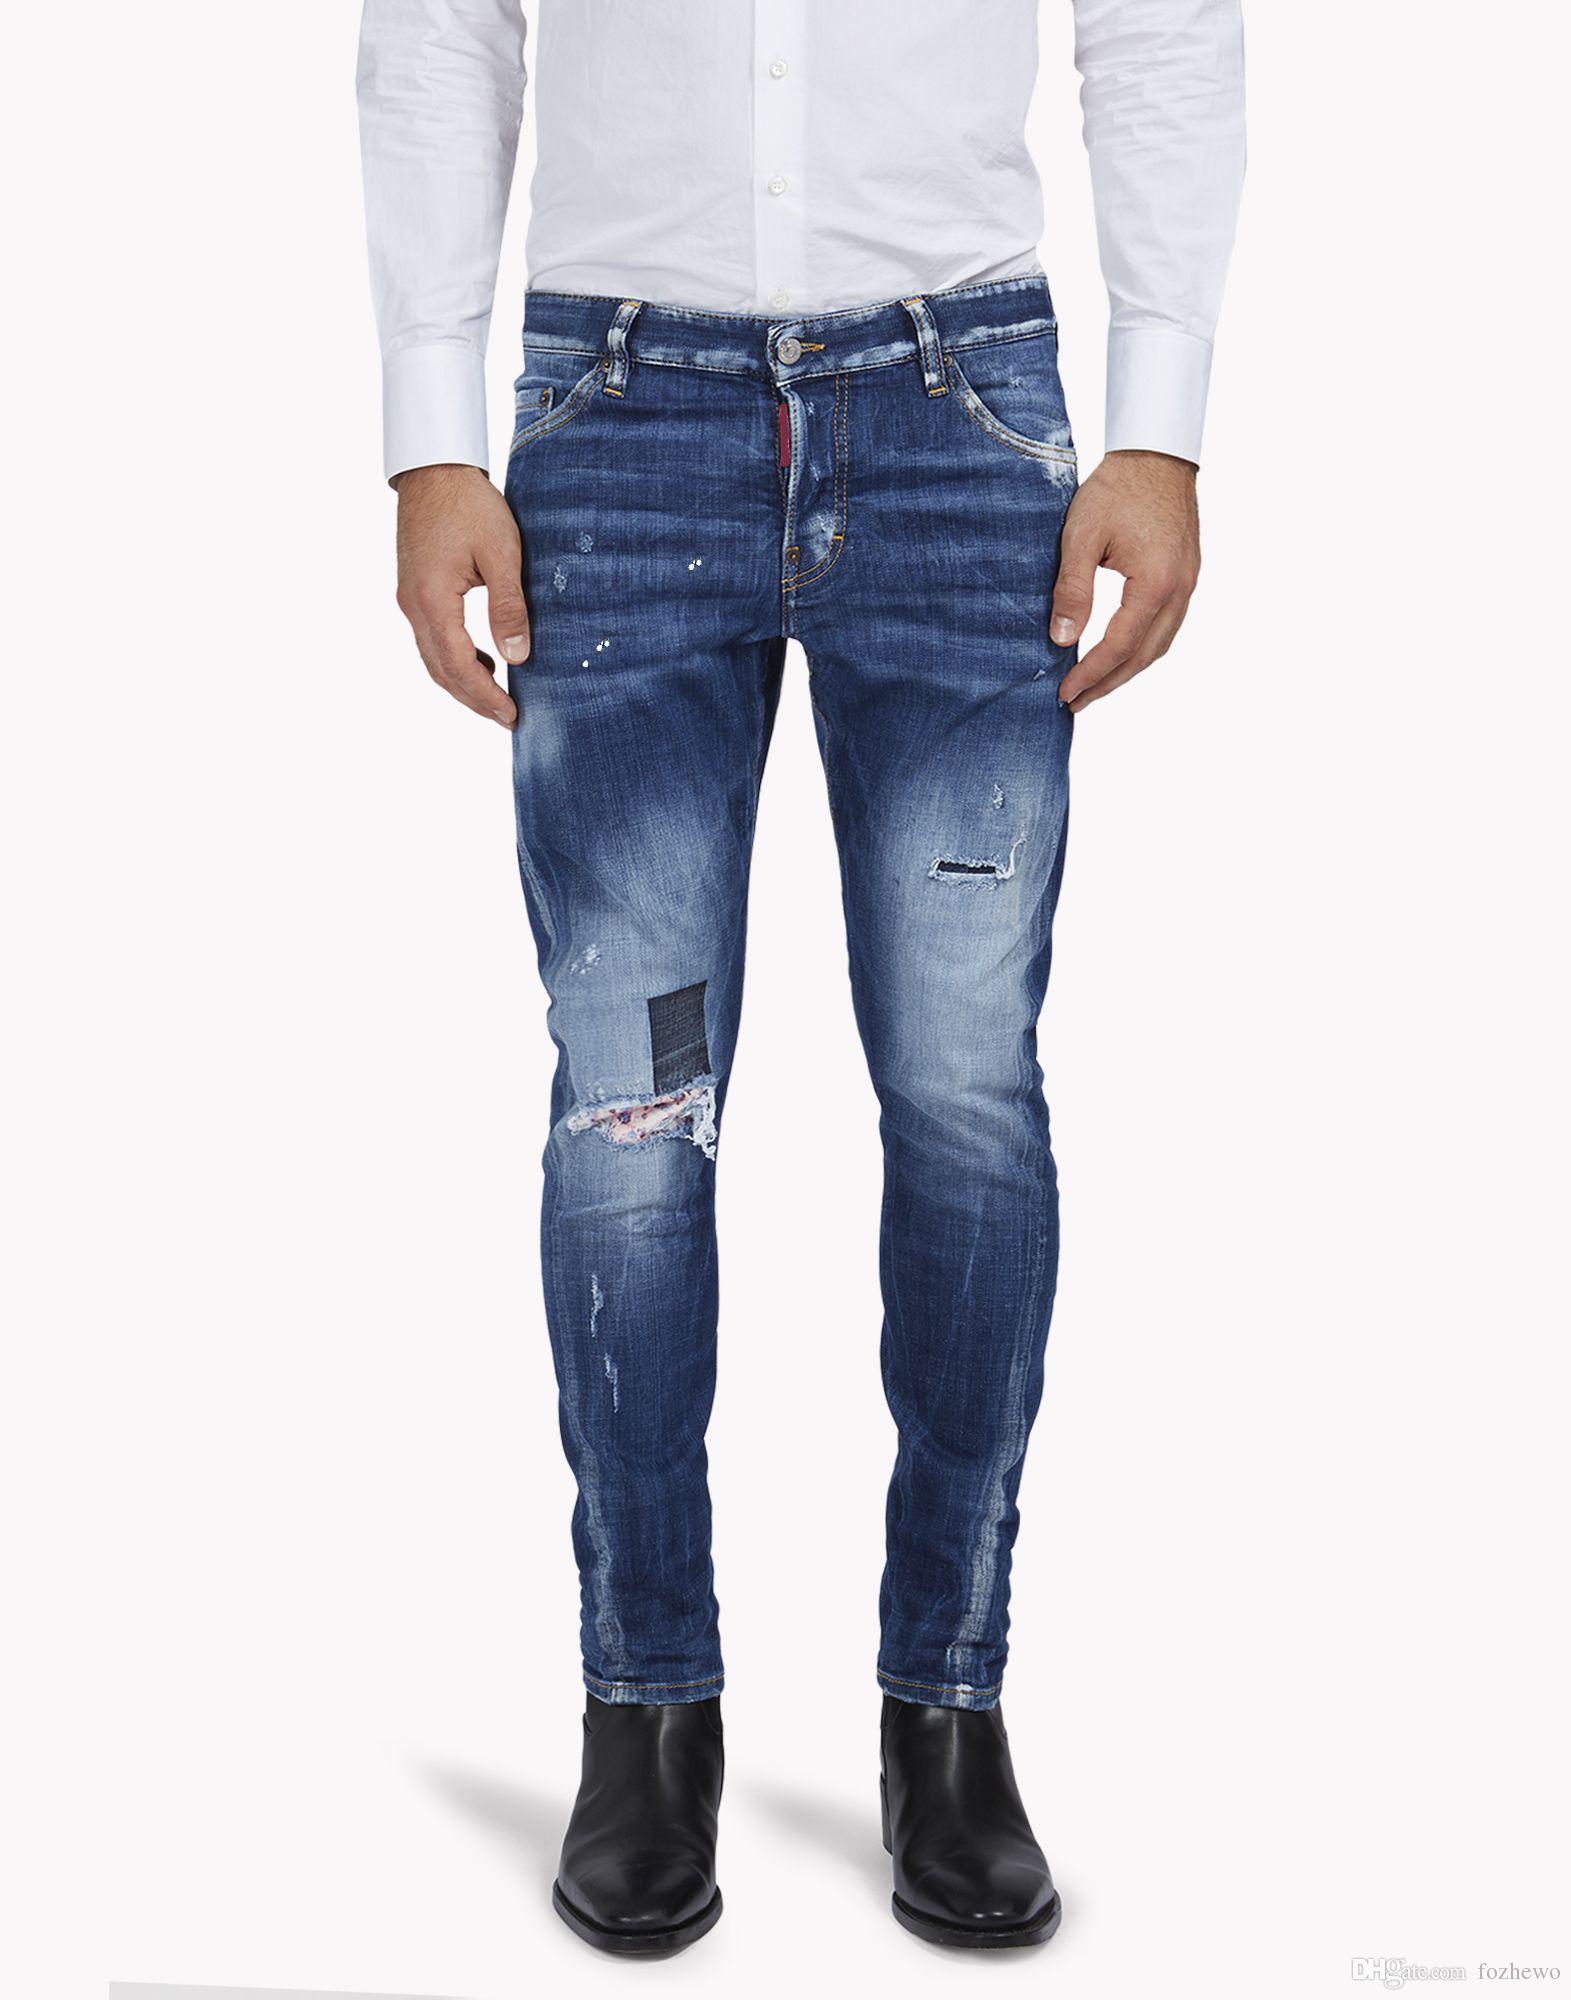 ead1f6b5a Pantalones de mezclilla de marca de lujo de los hombres de la marca de ropa  slim fit pantalones de mezclilla de moda pantalones de lápiz de calidad ...